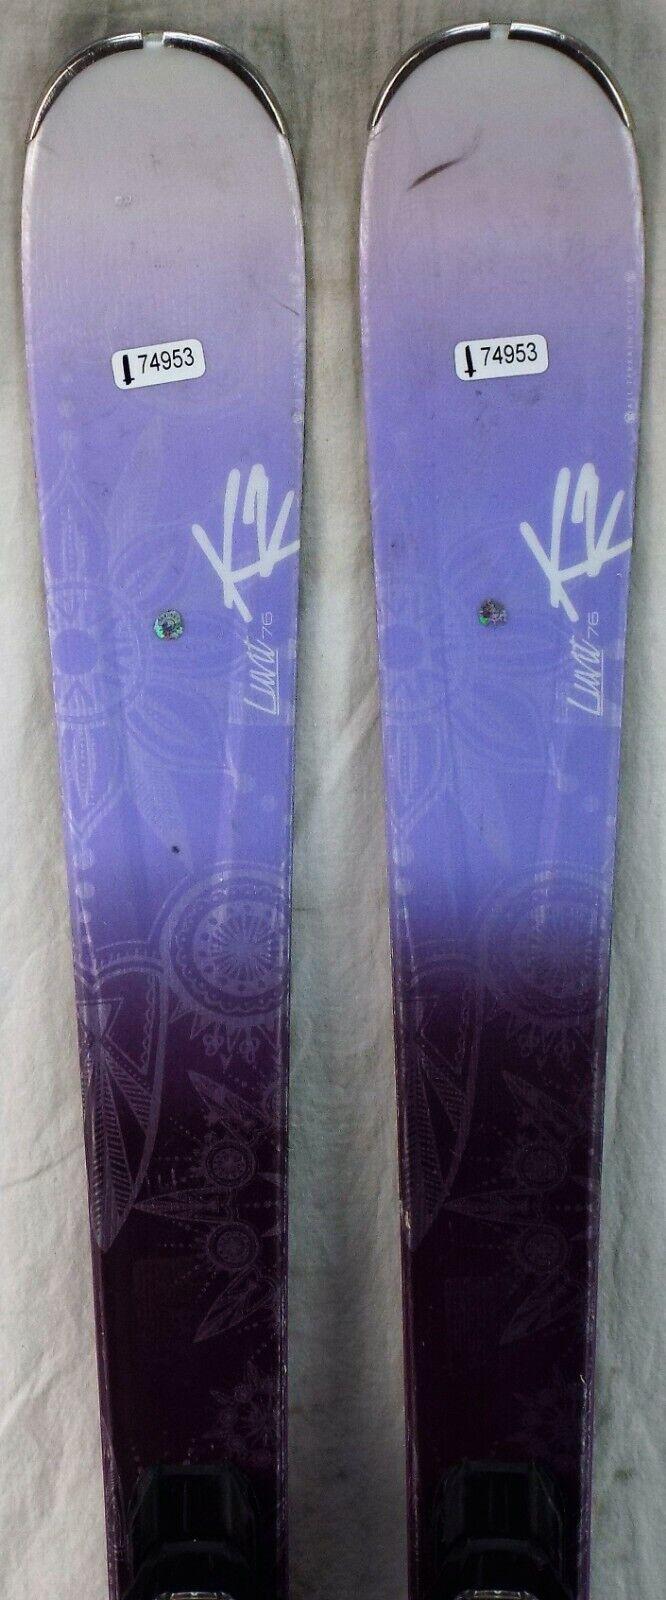 15-16 K2 LUVit 76 Gebruikte Womannen's Demo Skis w Binngs afmeting 149cm 35;174953